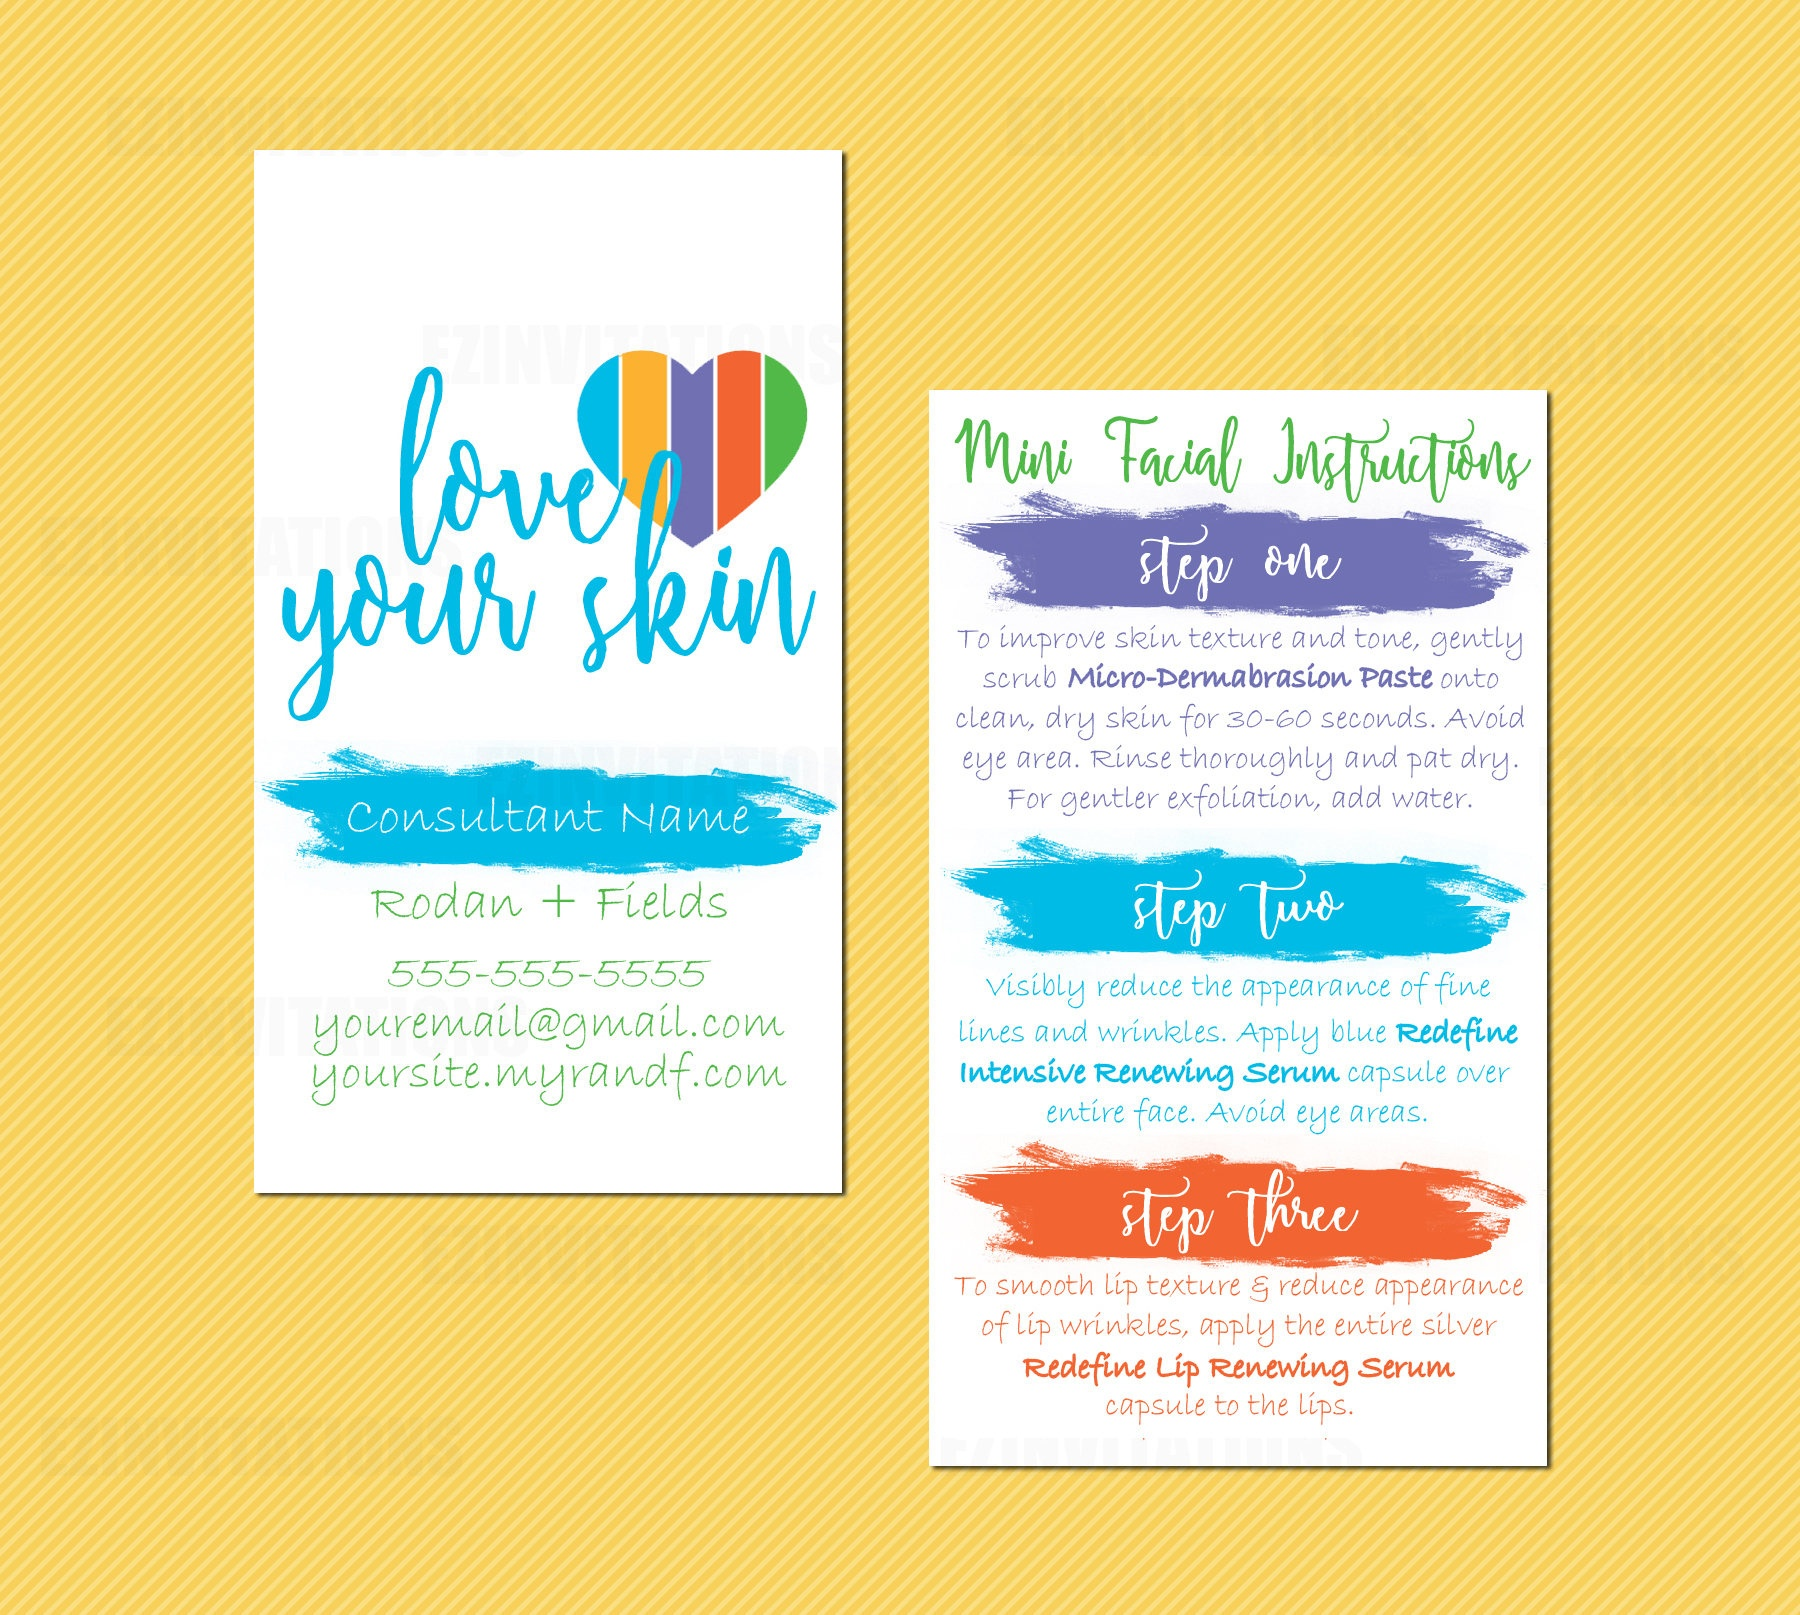 Rodan And Fields Mini Facial Card Rf Mini Facial | Etsy - Rodan And Fields Mini Facial Instructions Printable Free